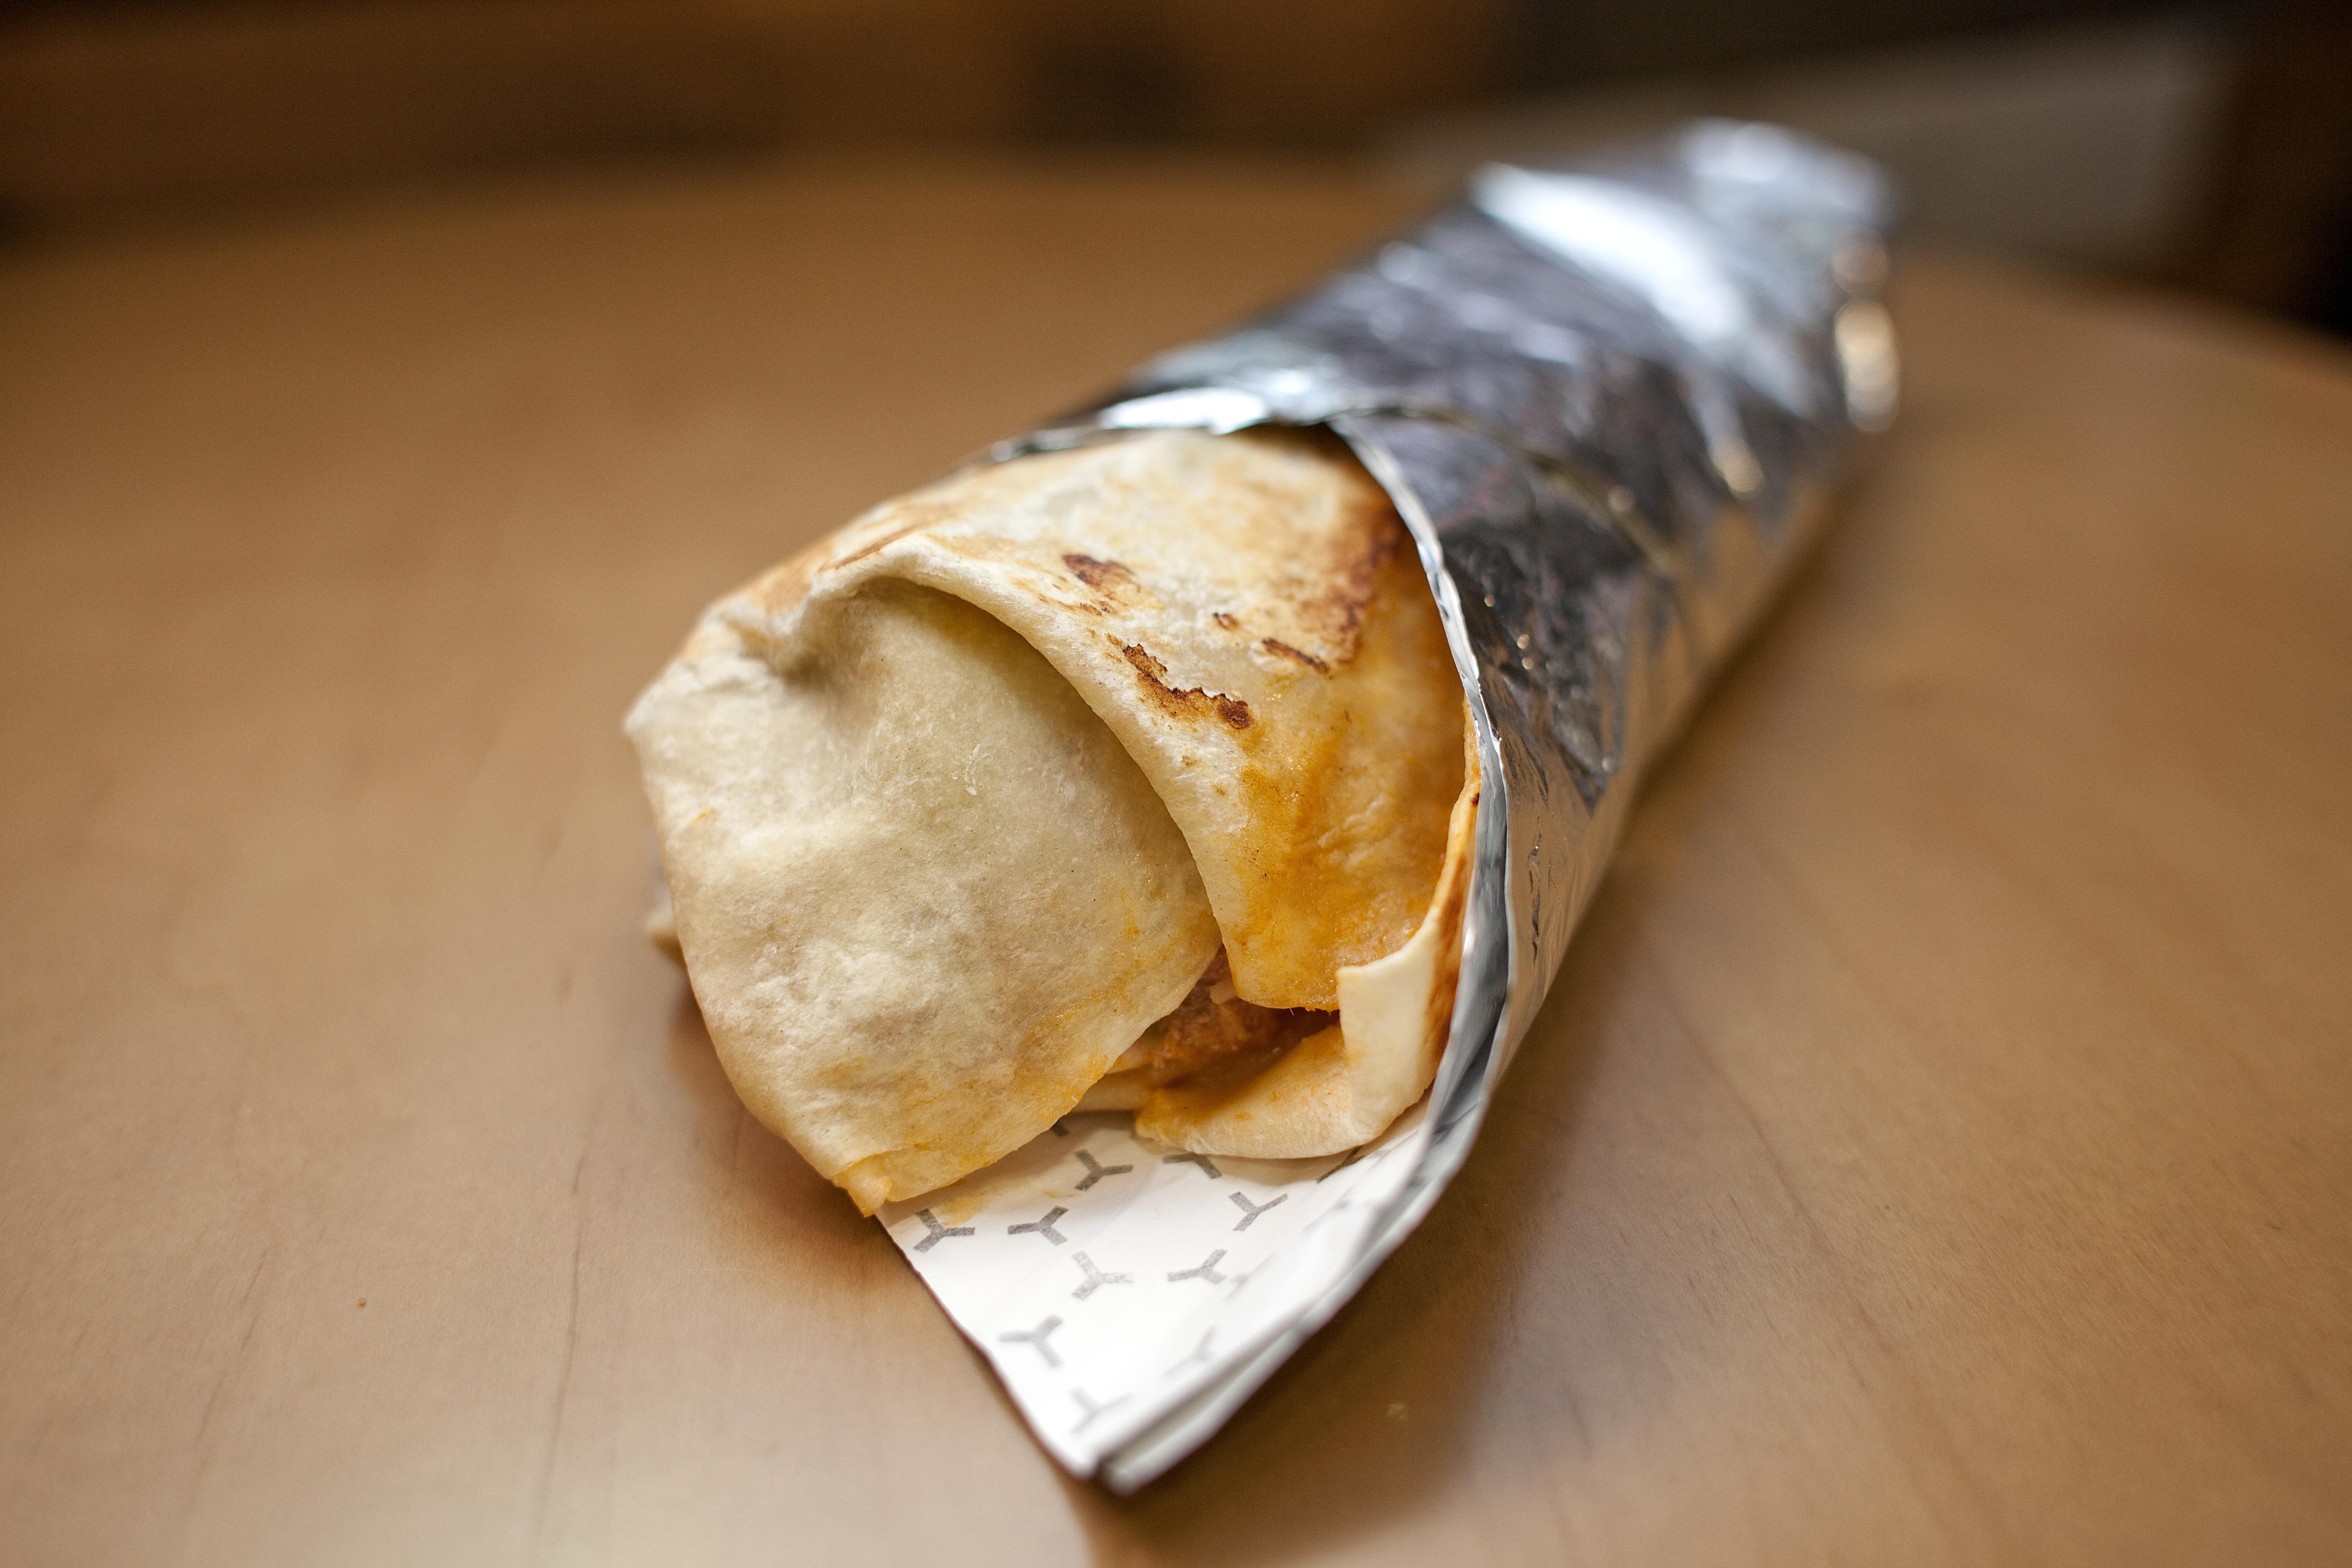 Burrito battle on King